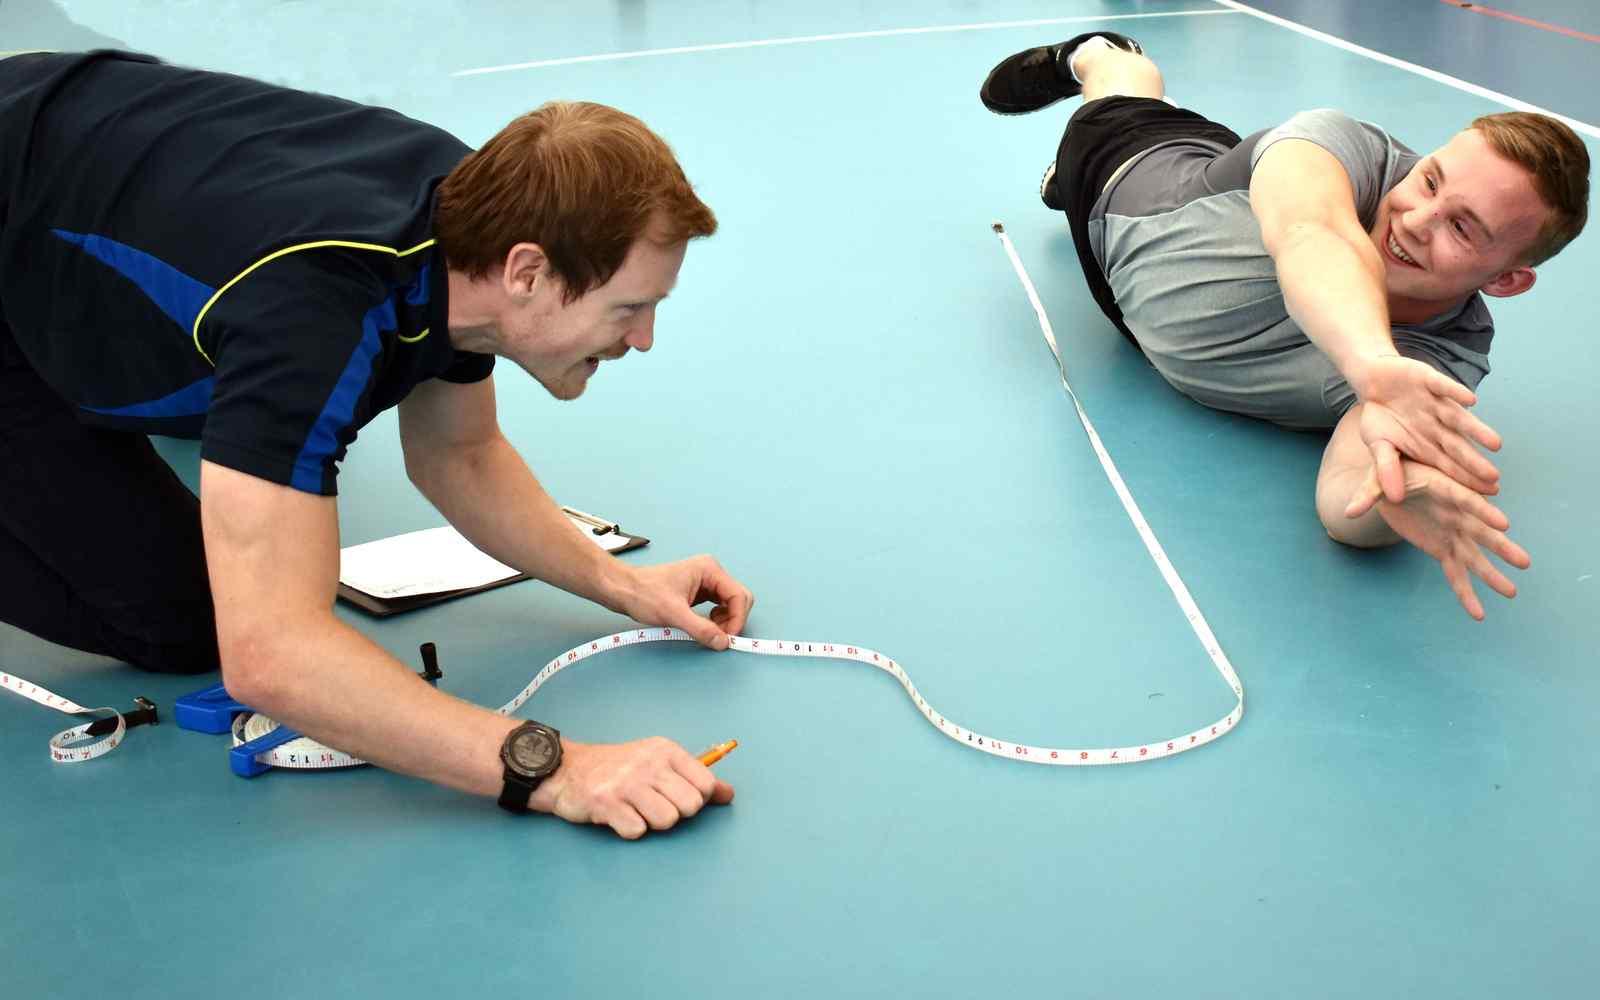 Para-athlete Josh McEntee undergoing fitness testing at YSJ